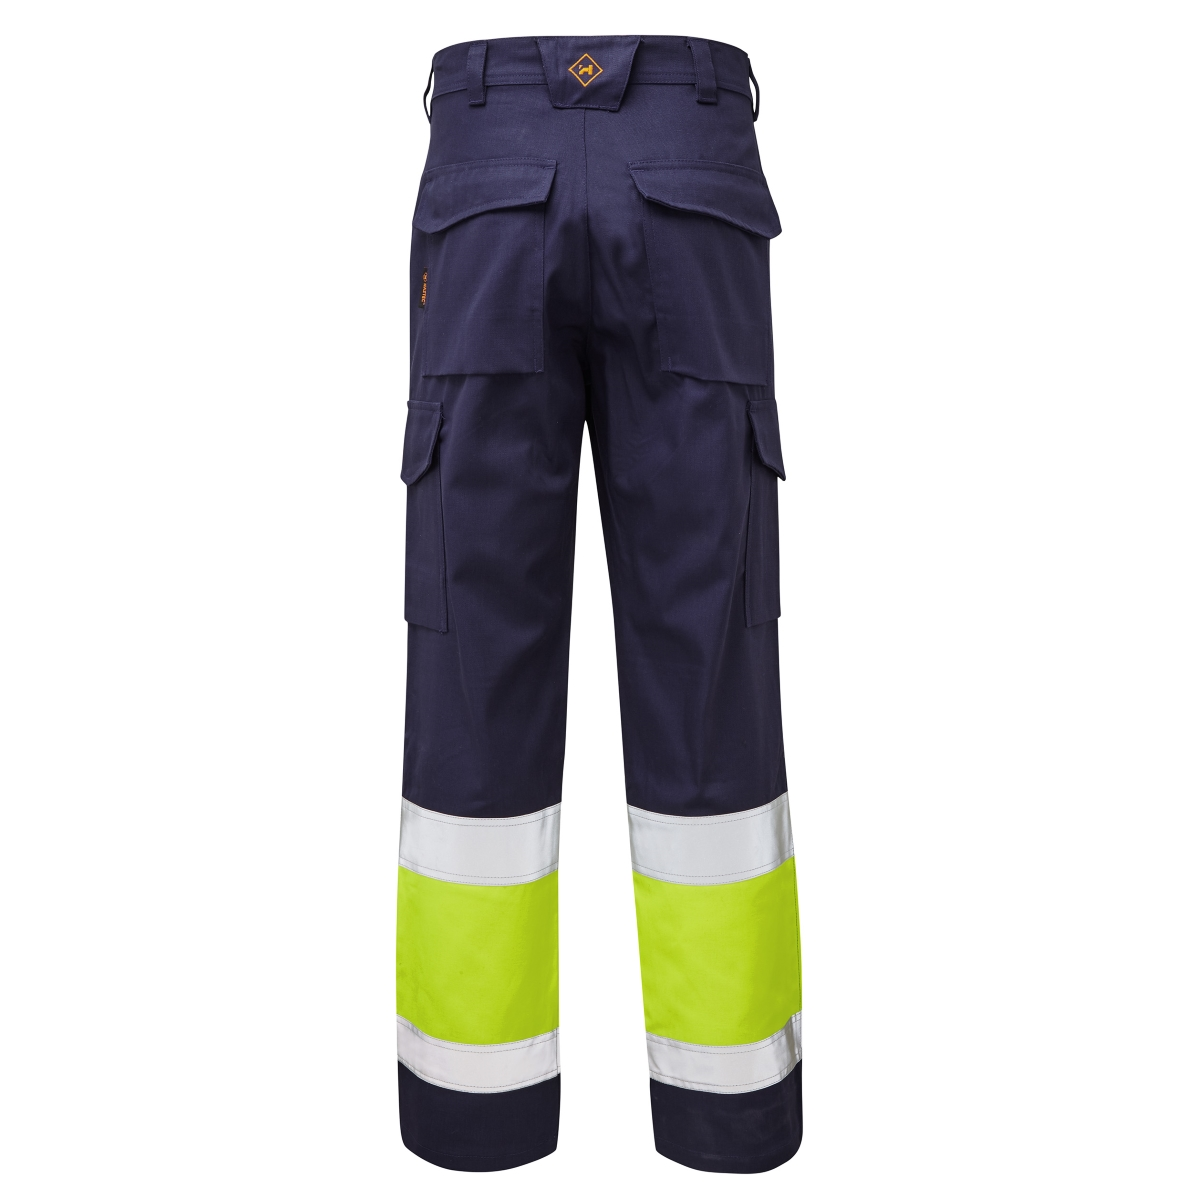 Haztec FR/AS Class 1 Hi-Vis trouser 275 gsm